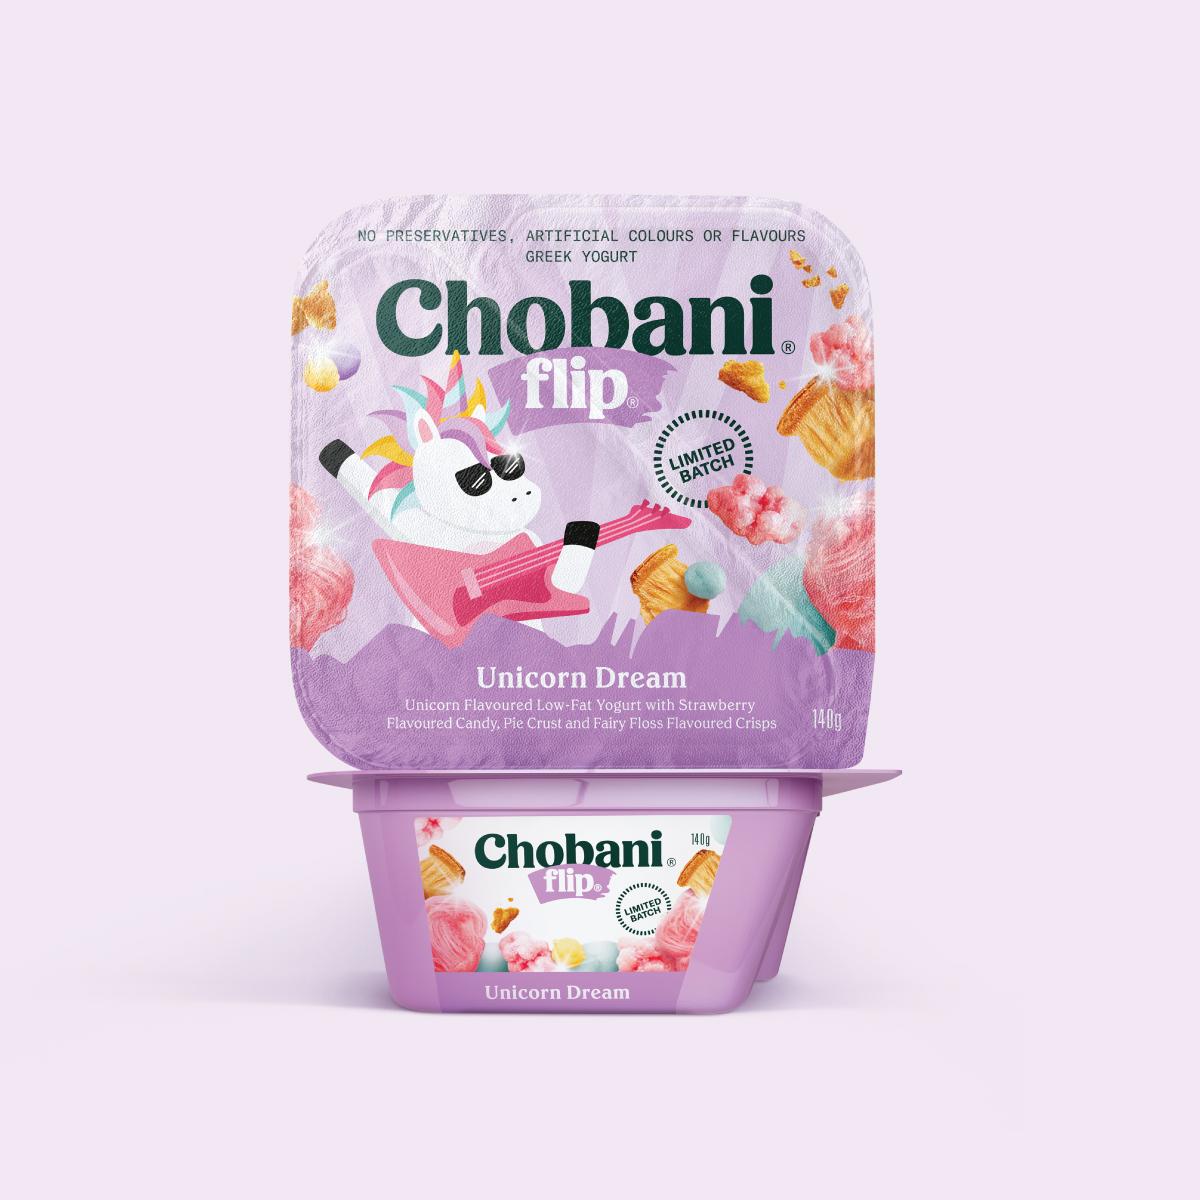 Chobani Yogurt Unicorn Packaging Design FMCG